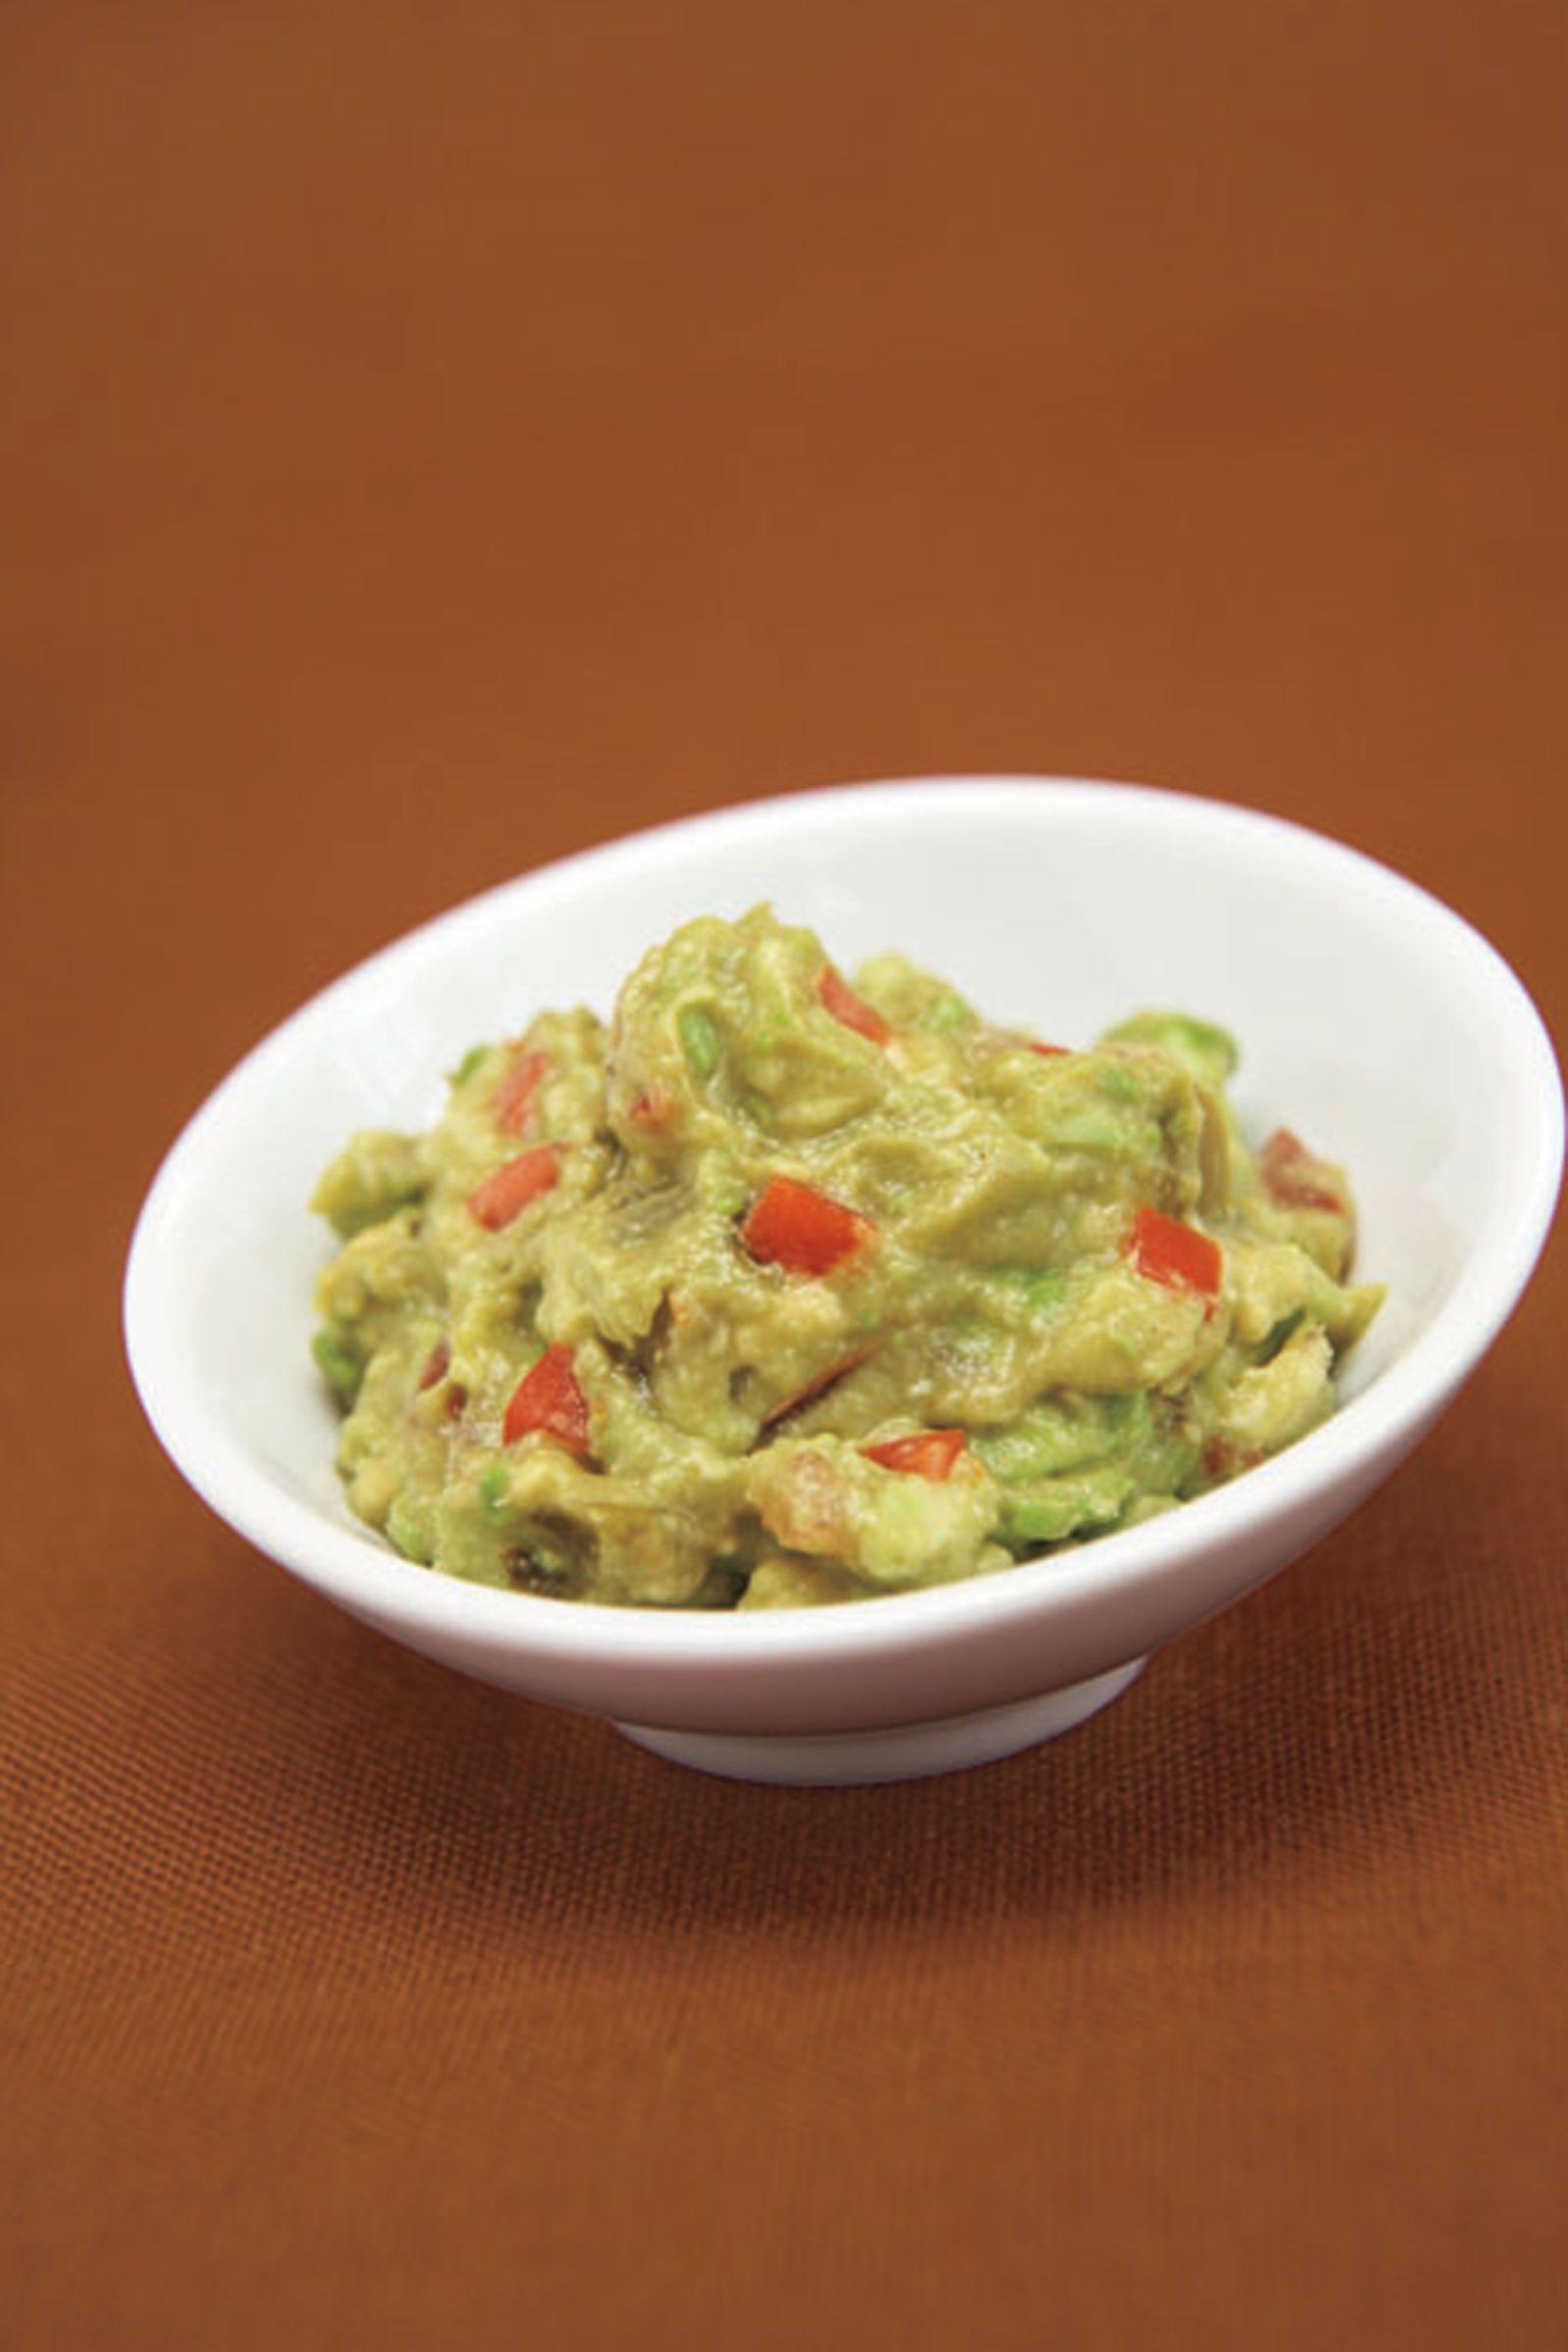 Calories 1/3 cup guacamole